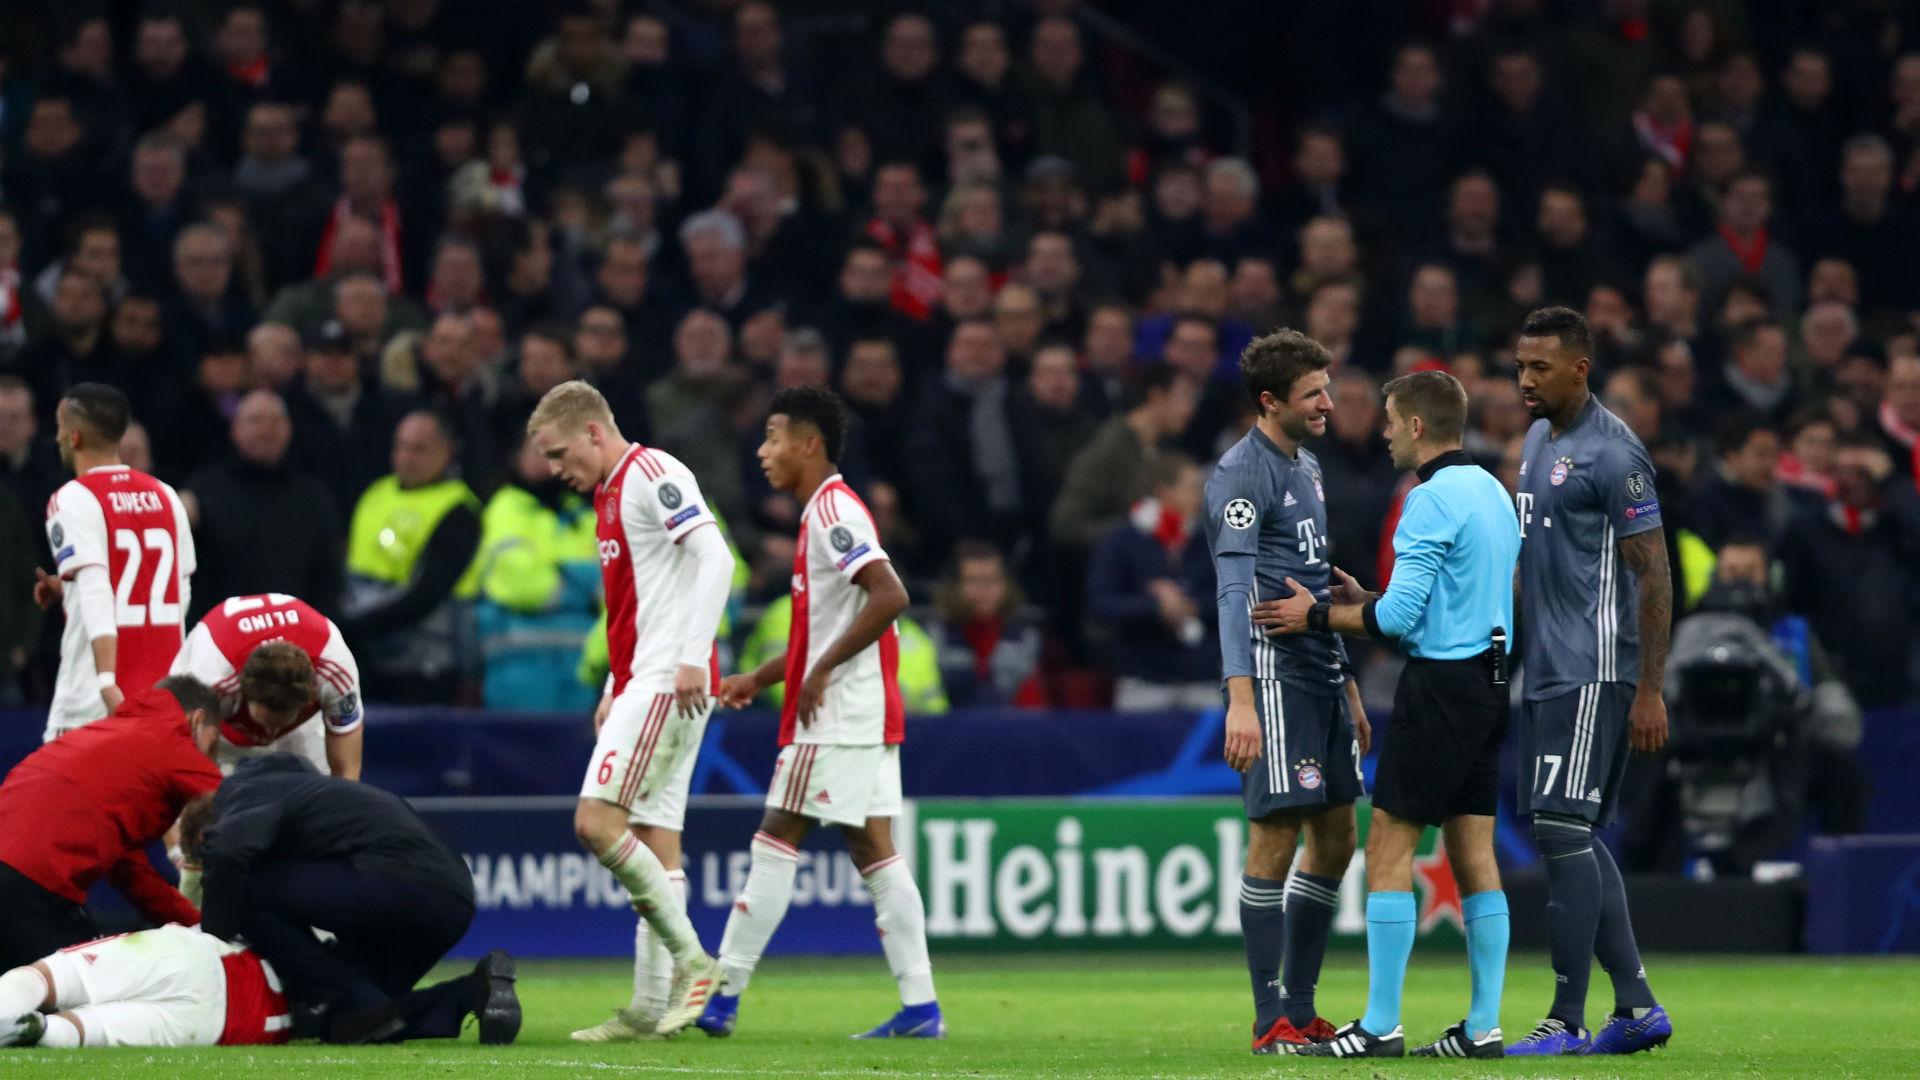 Muller apologises to Tagliafico for kick to the head